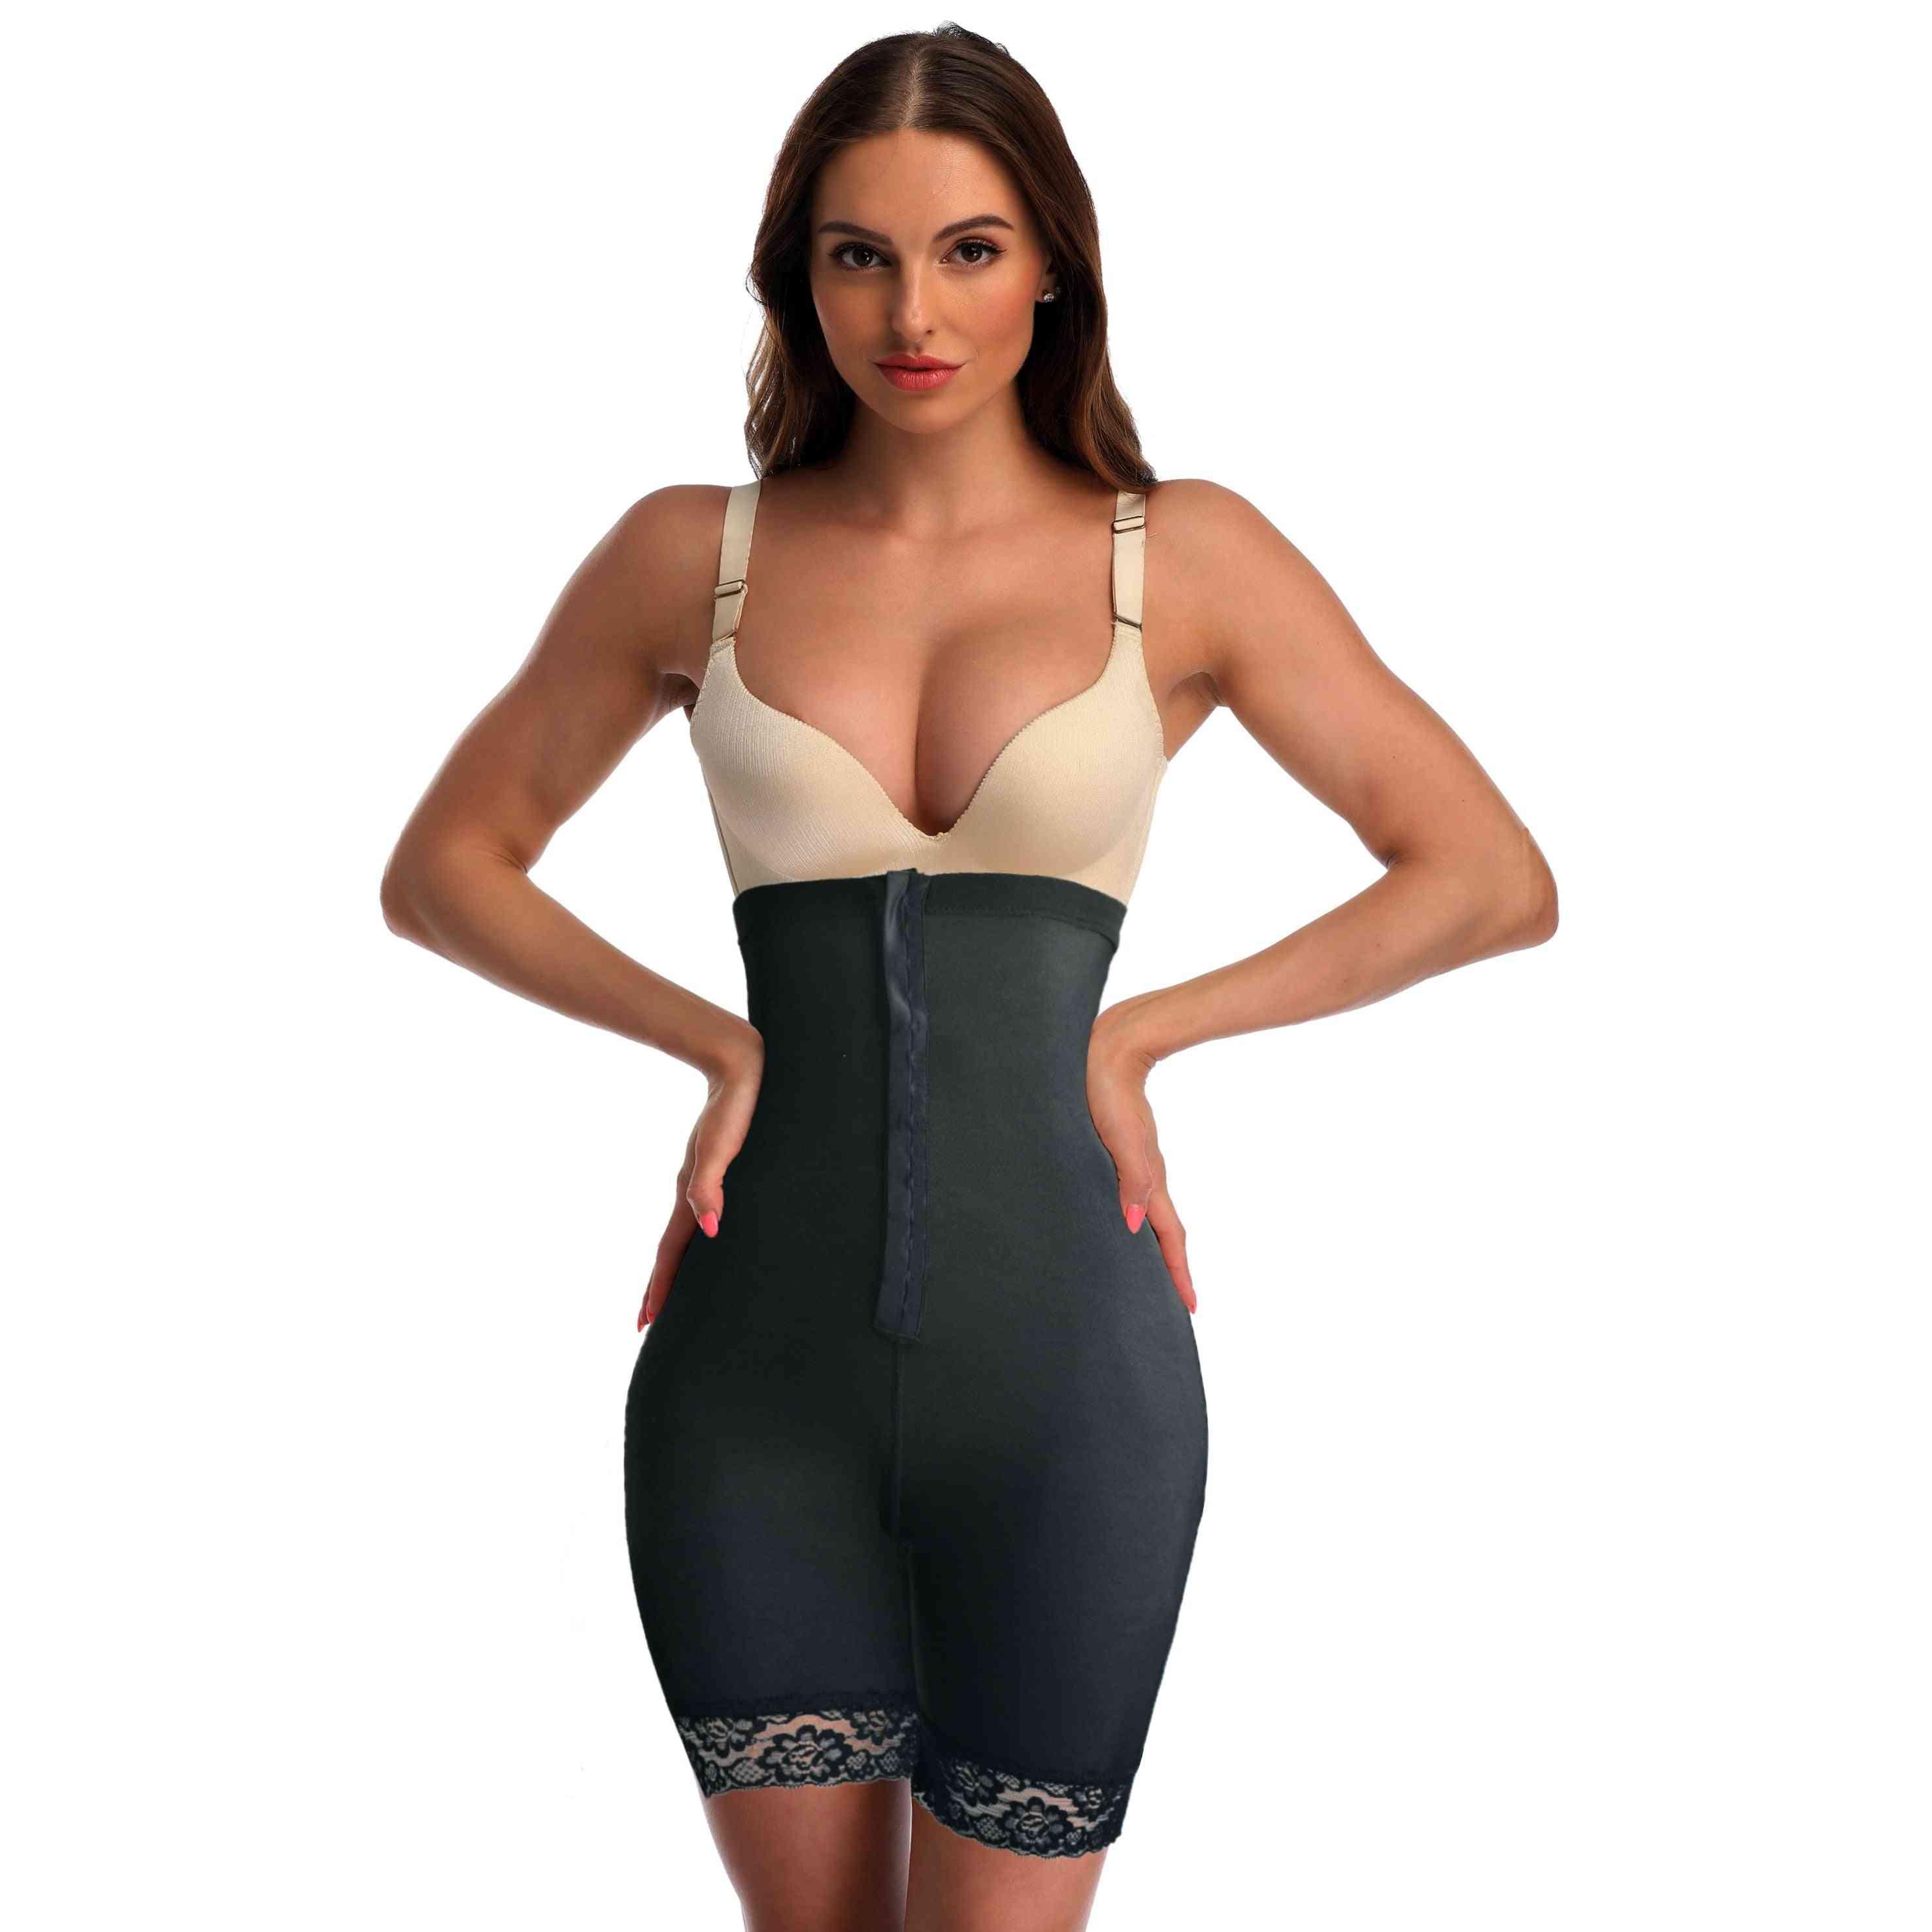 Waist Trainer Tummy Shaper Girdle Pulling Corset Slimming Underwear Belt Shapewear Body